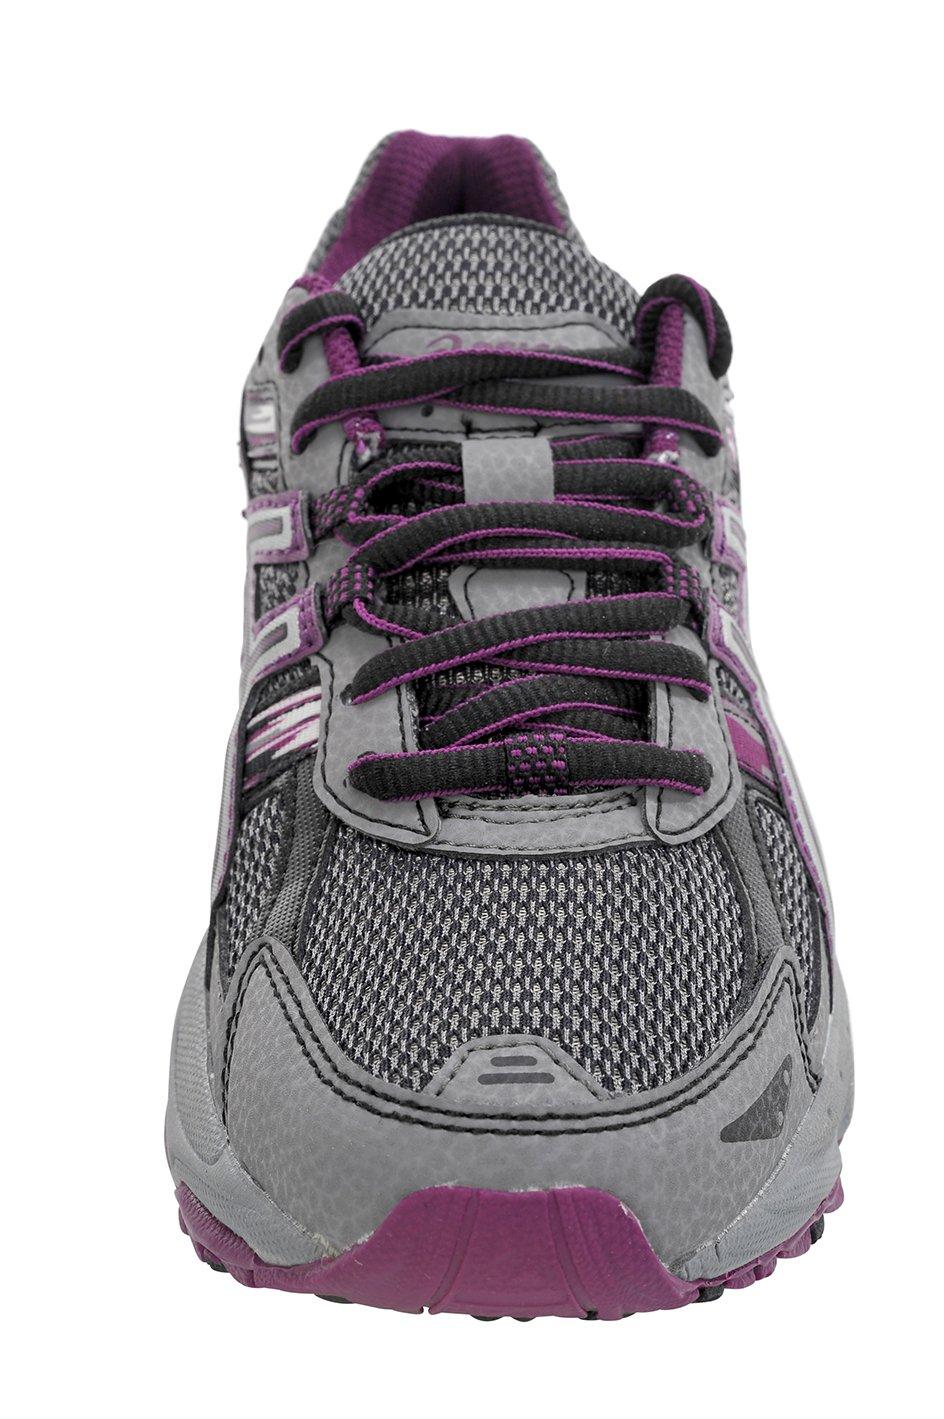 ASICS Women's GEL-Venture 5 Running Shoe B01H7T1CVW 6.5 B(M) US|Frost Gray/Gray/Silver/Magenta